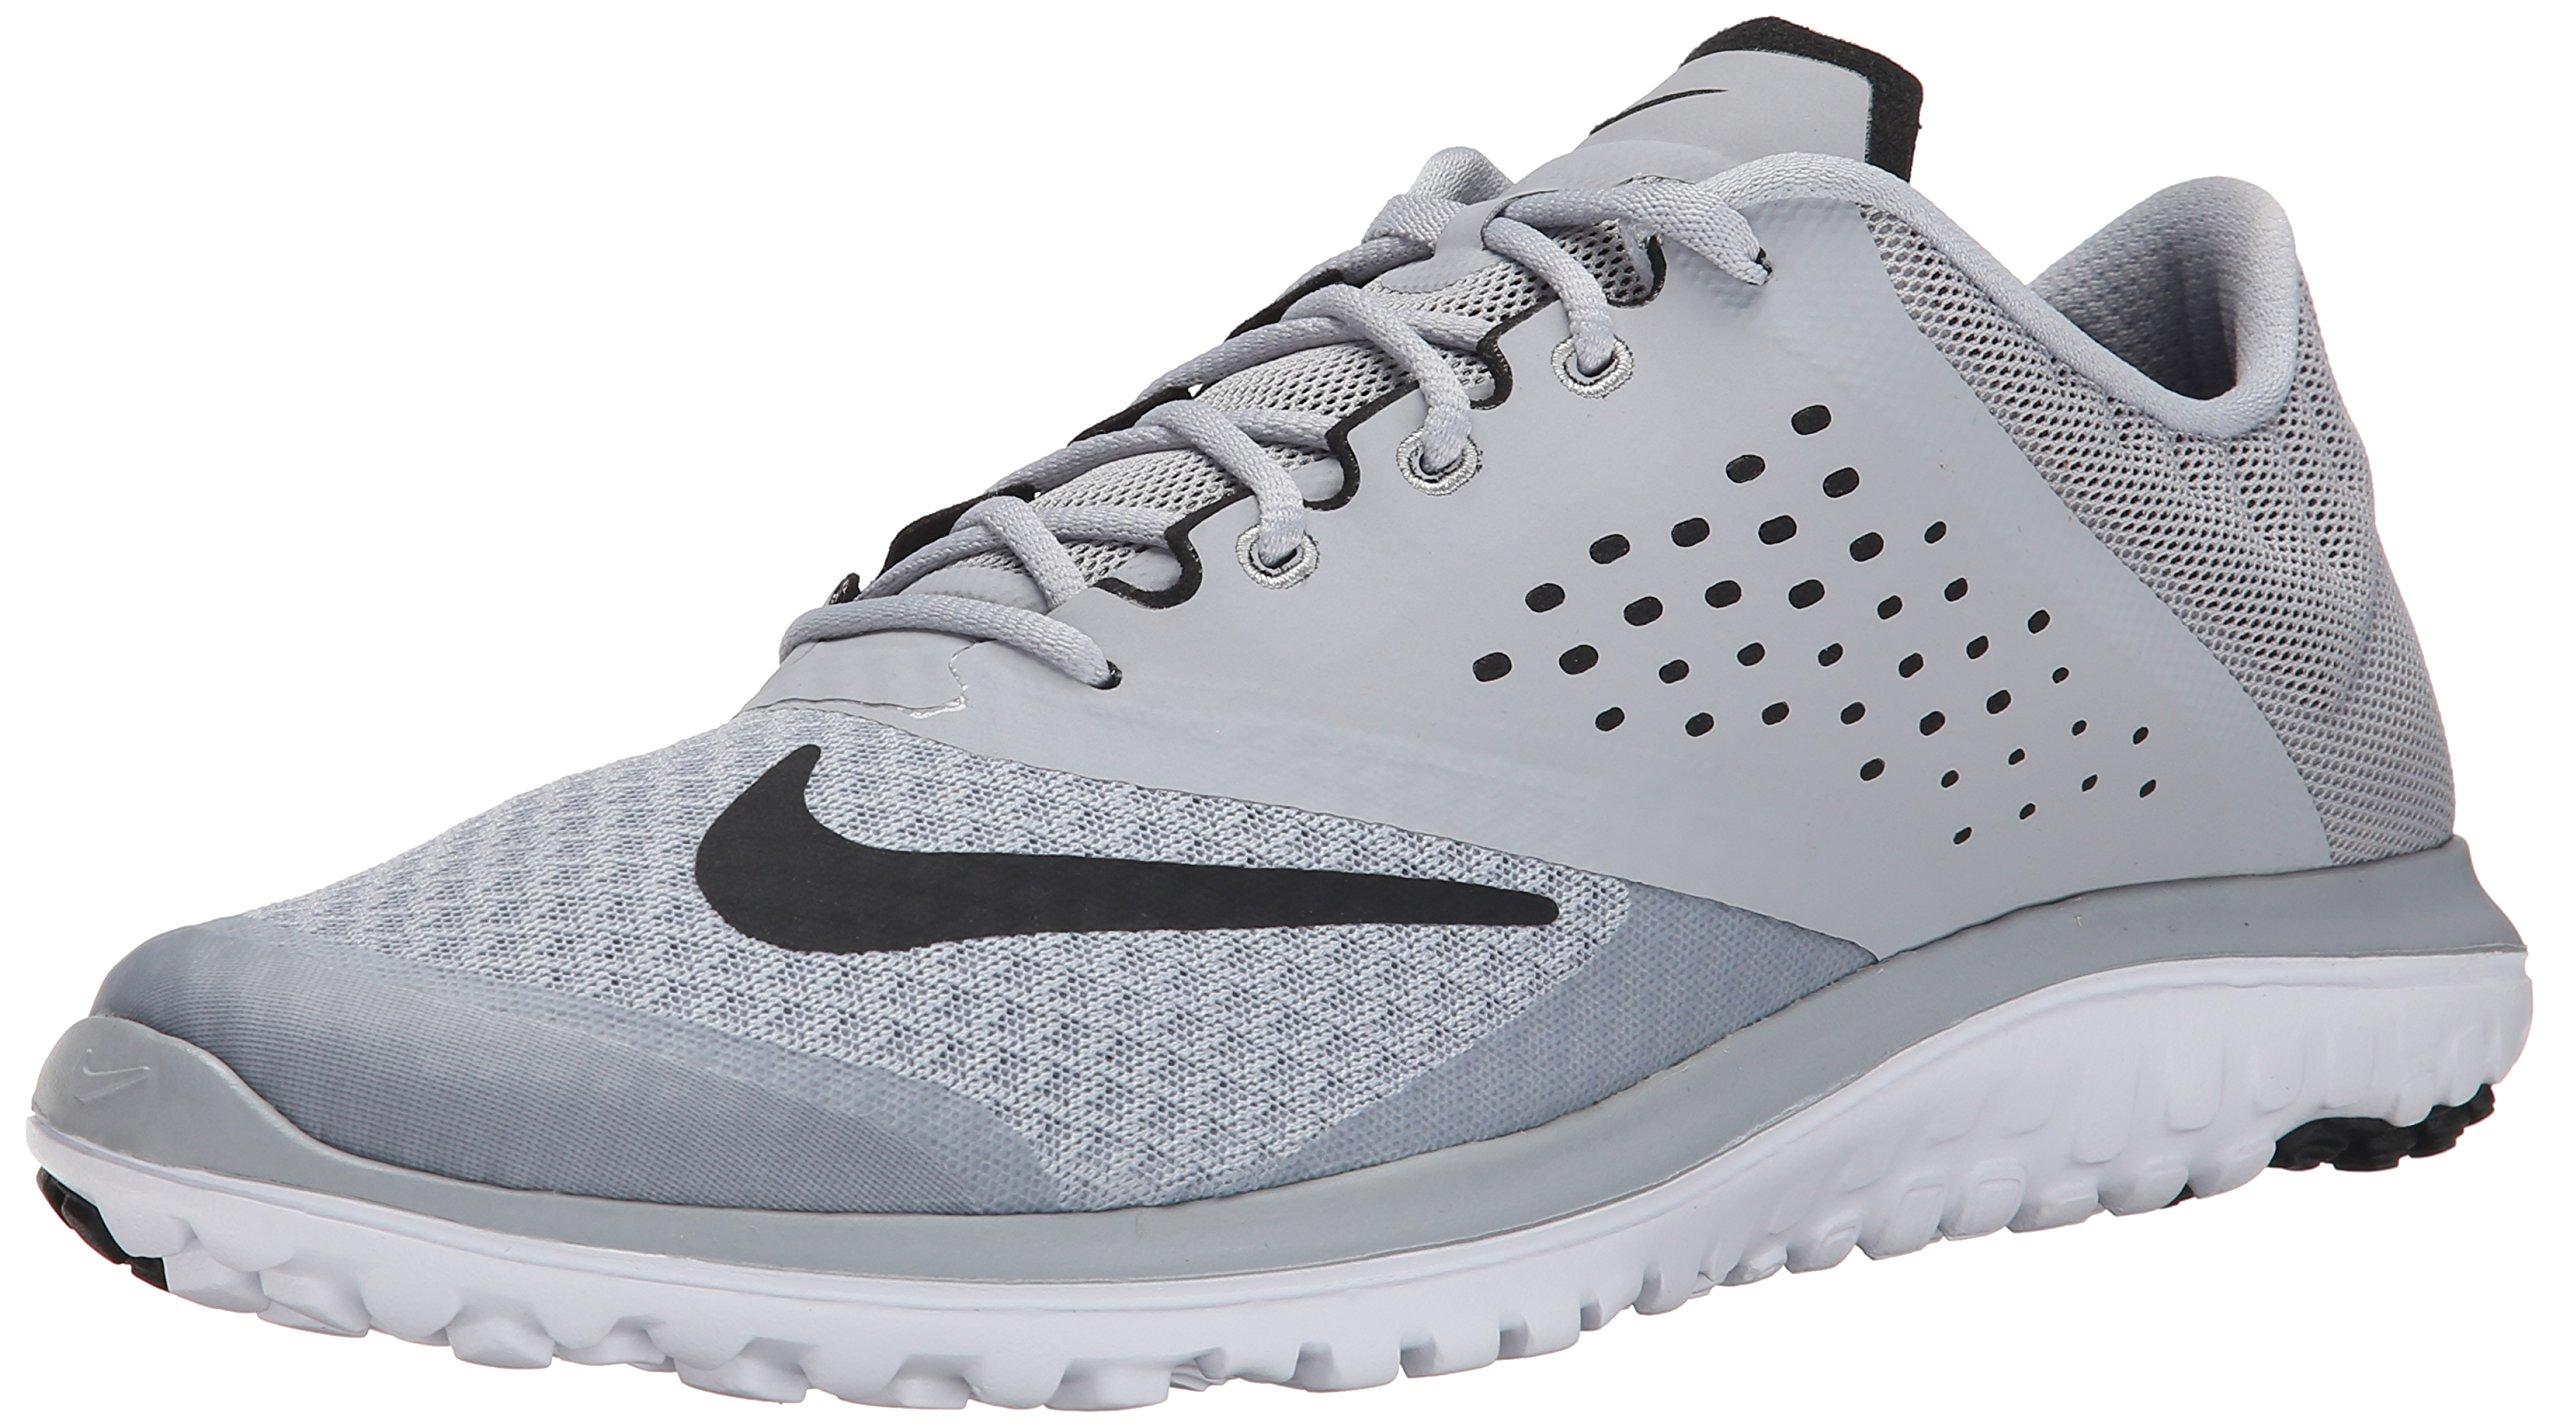 top design 34901 89cc7 Galleon - Nike Men's FS Lite Run 2 Shoe, Wolf Grey/Black ...